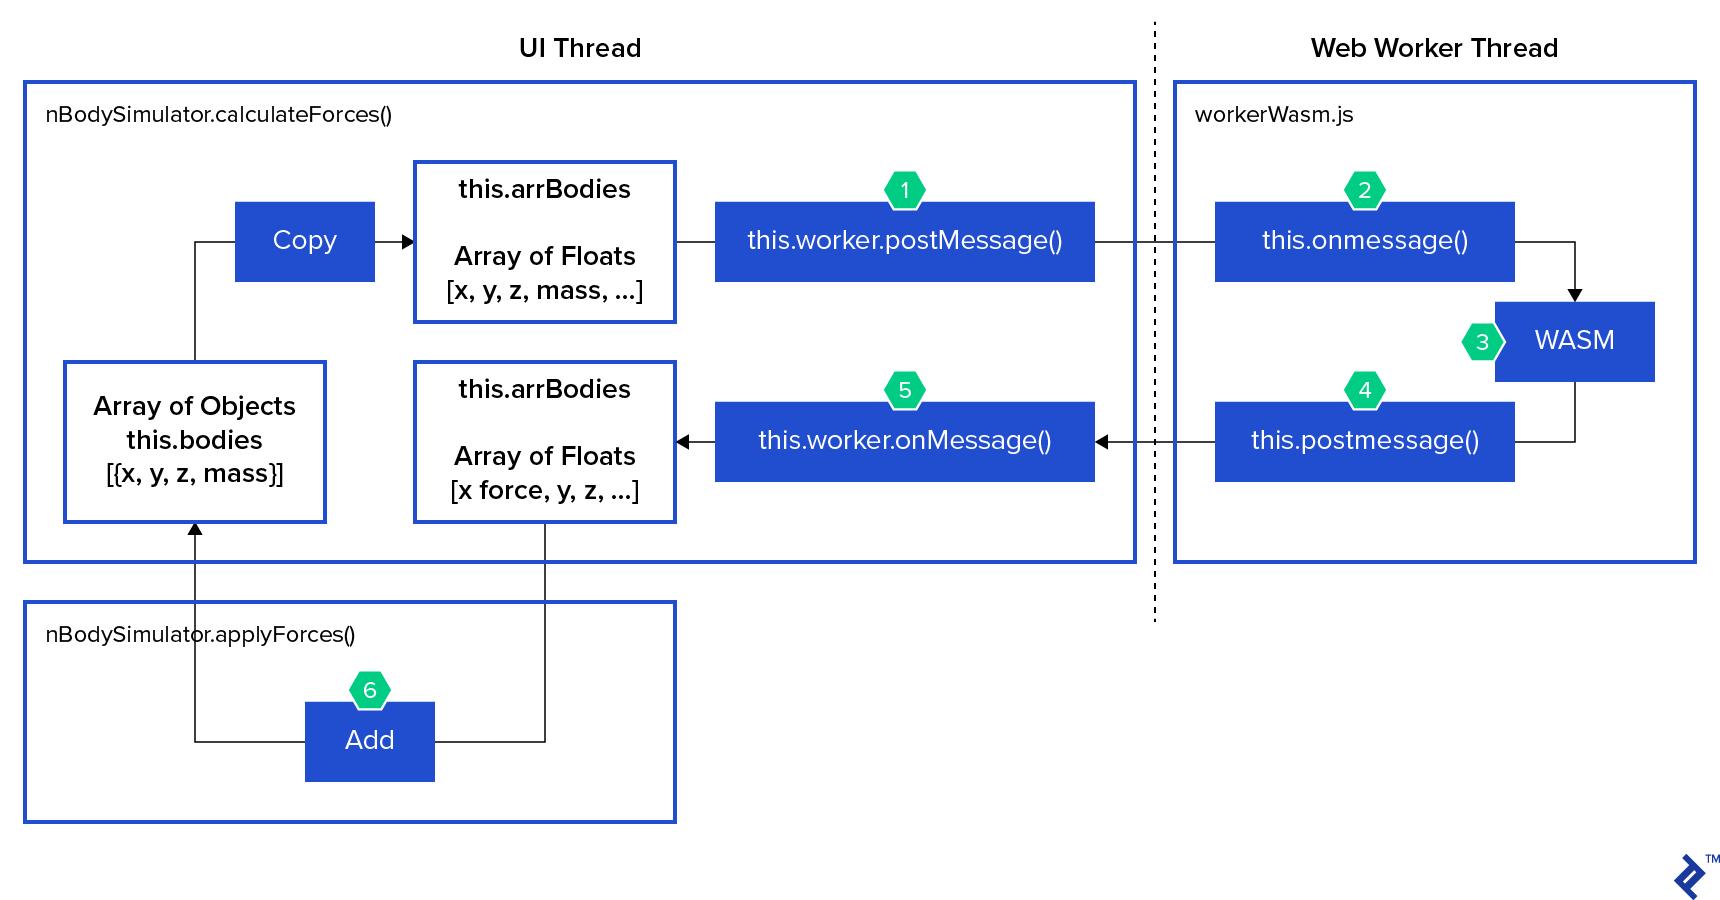 UI thread, web worker thread